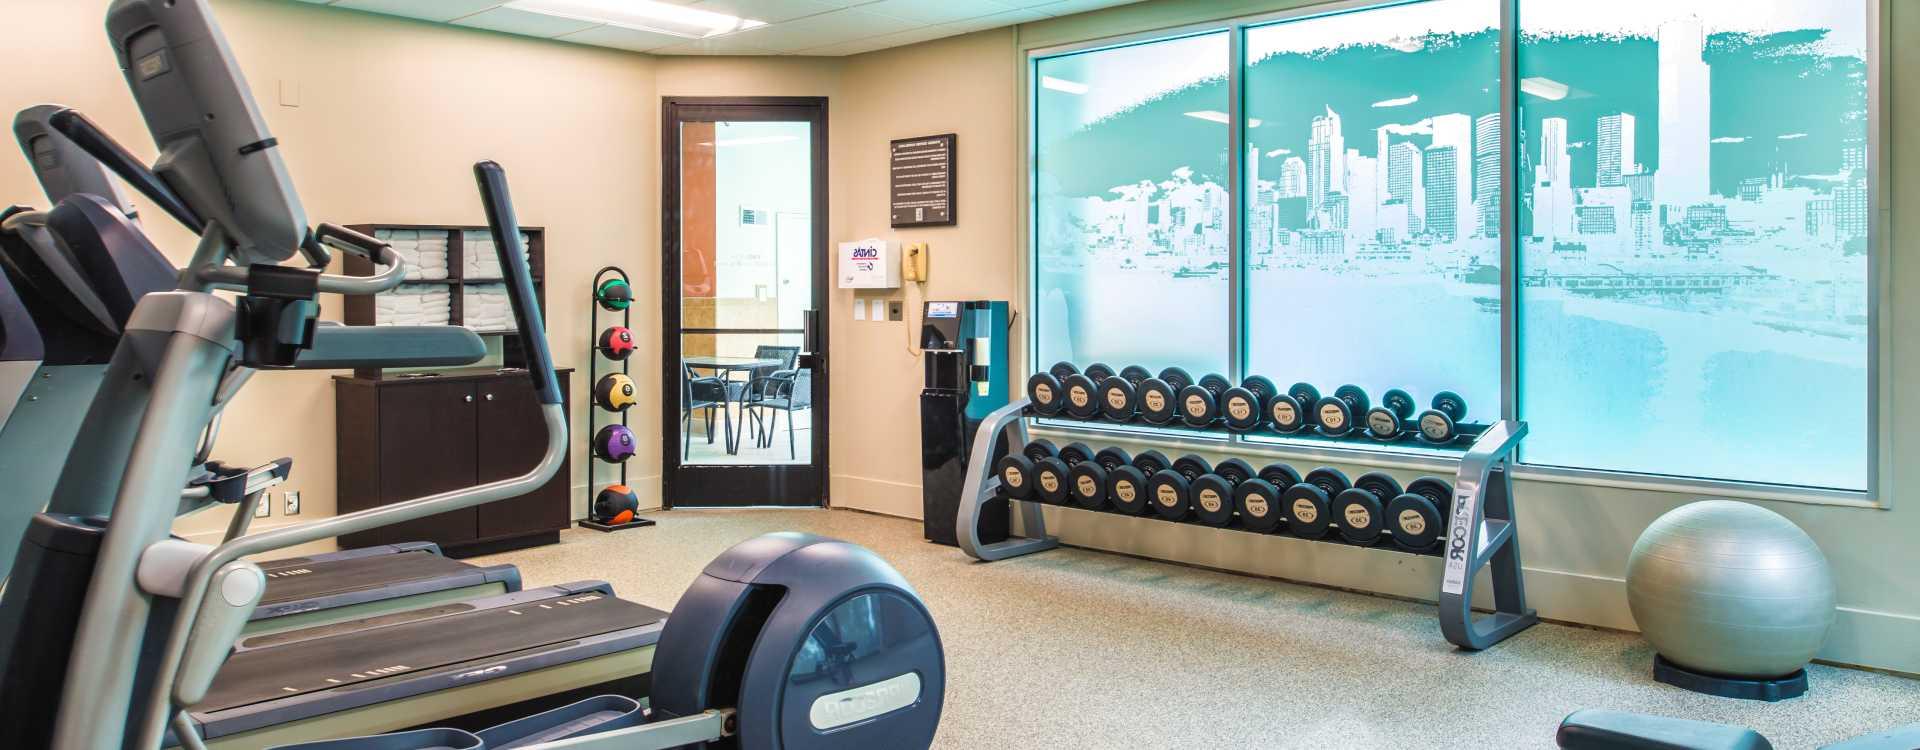 Fitness Center 24 hours